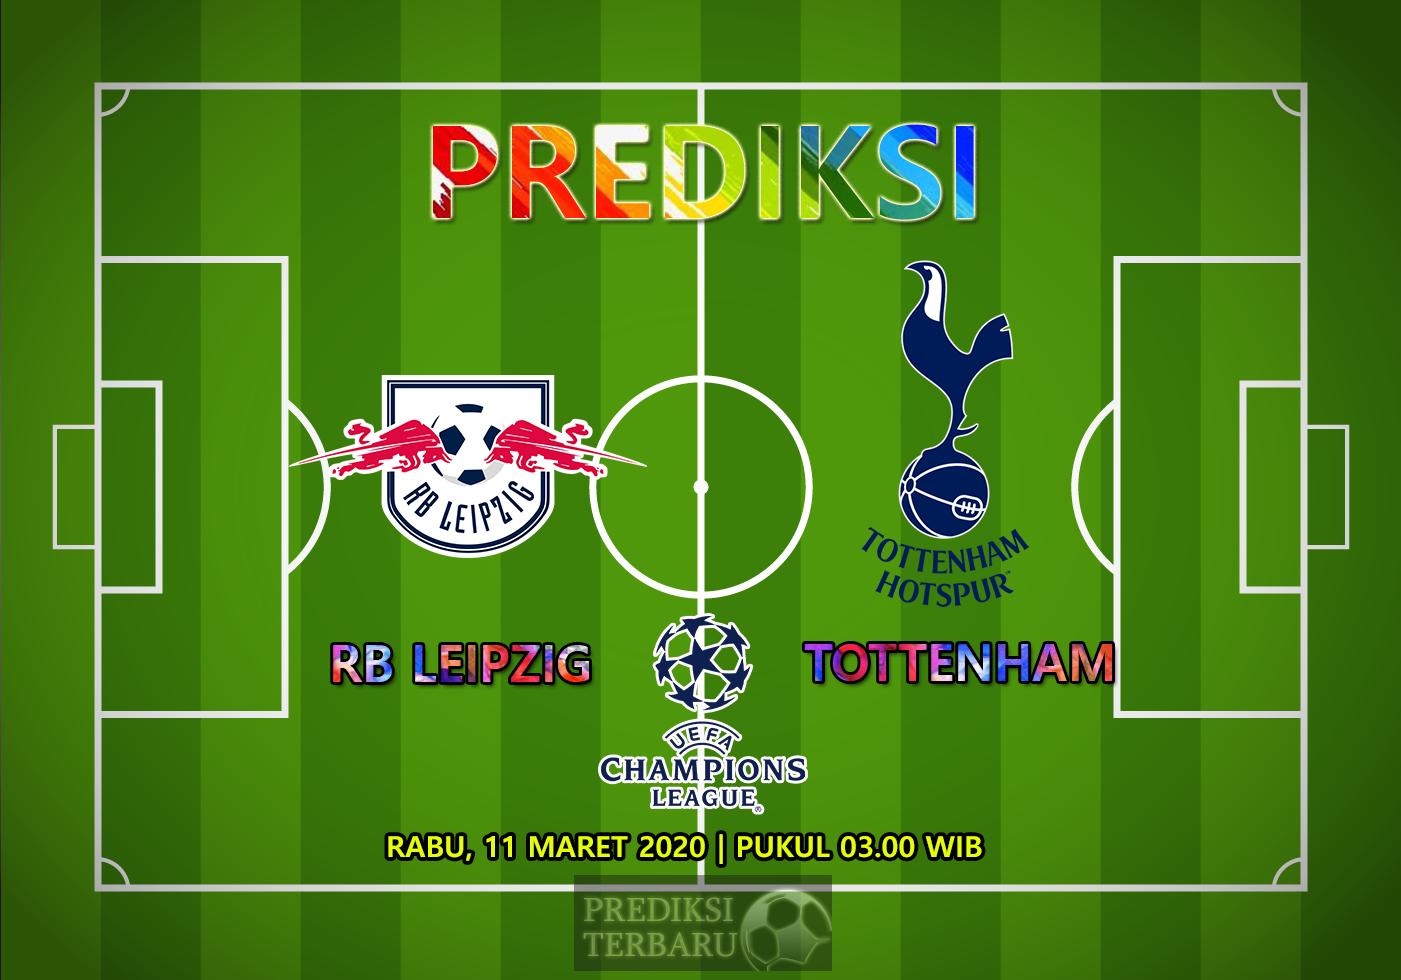 Prediksi RB Leibzig Vs Tottenham Hotspur Rabu 11 Maret